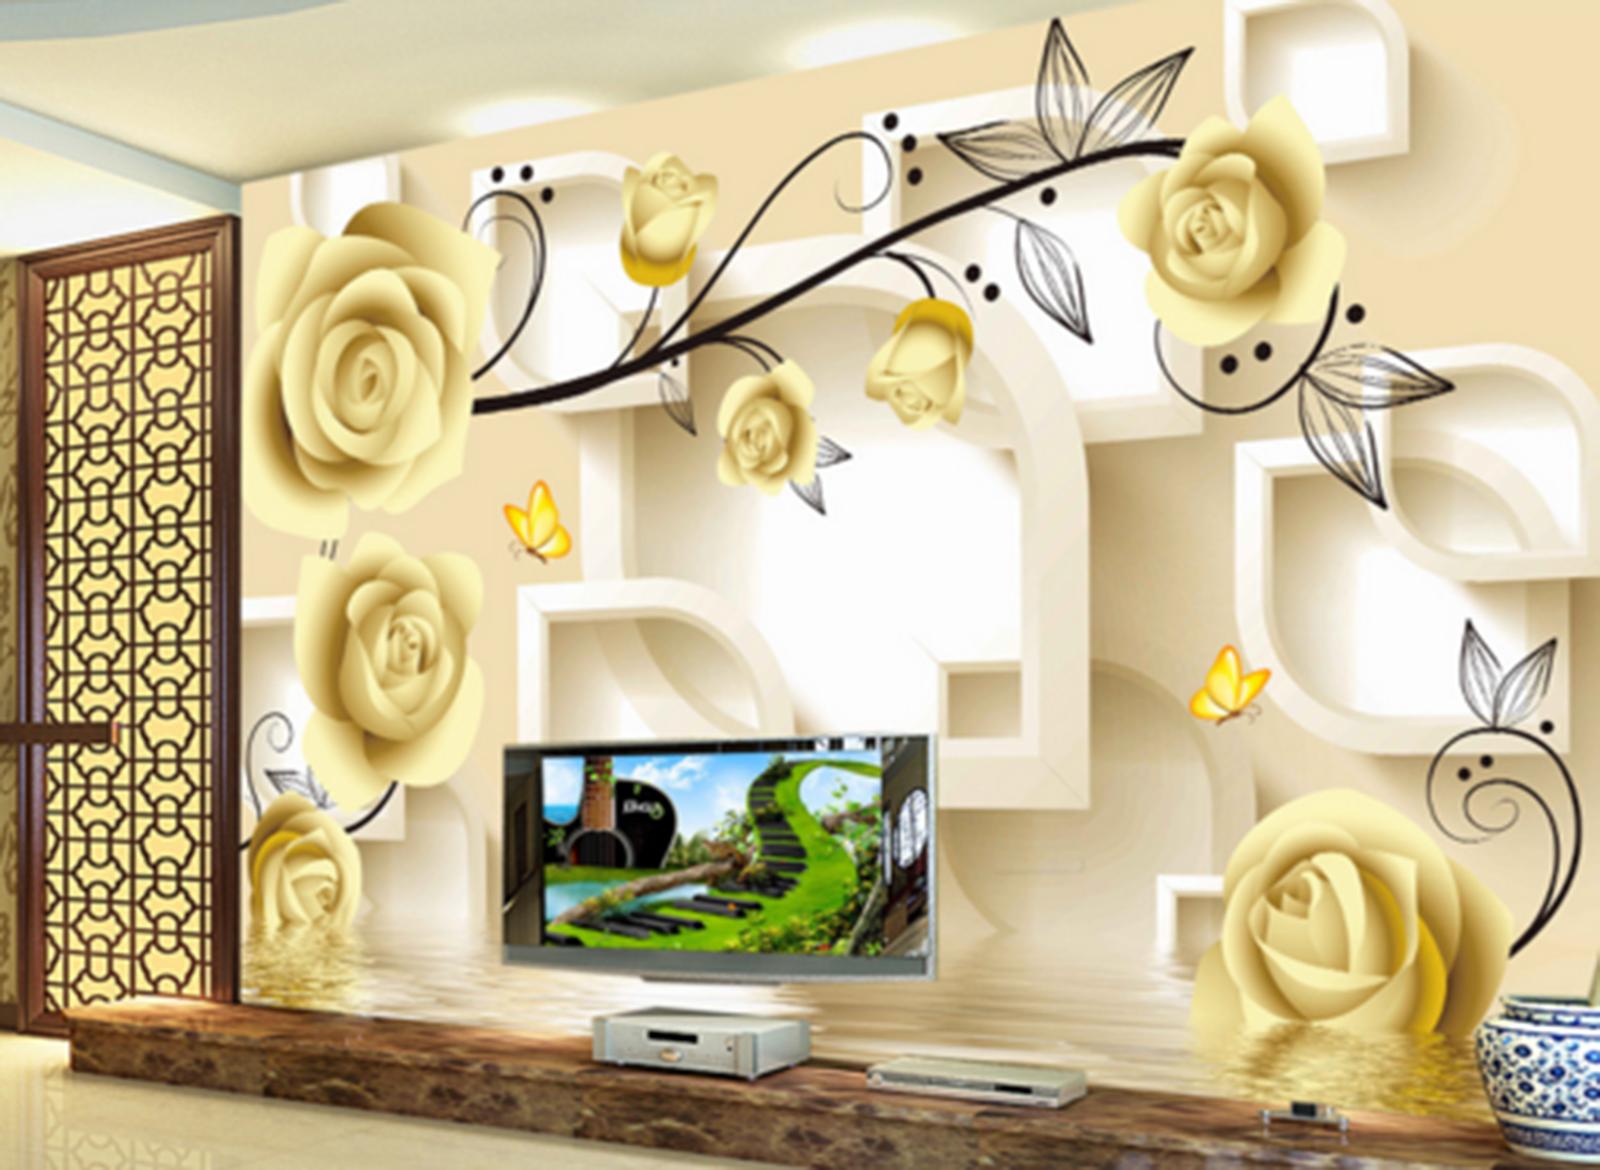 3D Golden Flowers Bud Squid Wall Paper Wall Print Print Print Decal Wall AJ WALLPAPER CA c56120